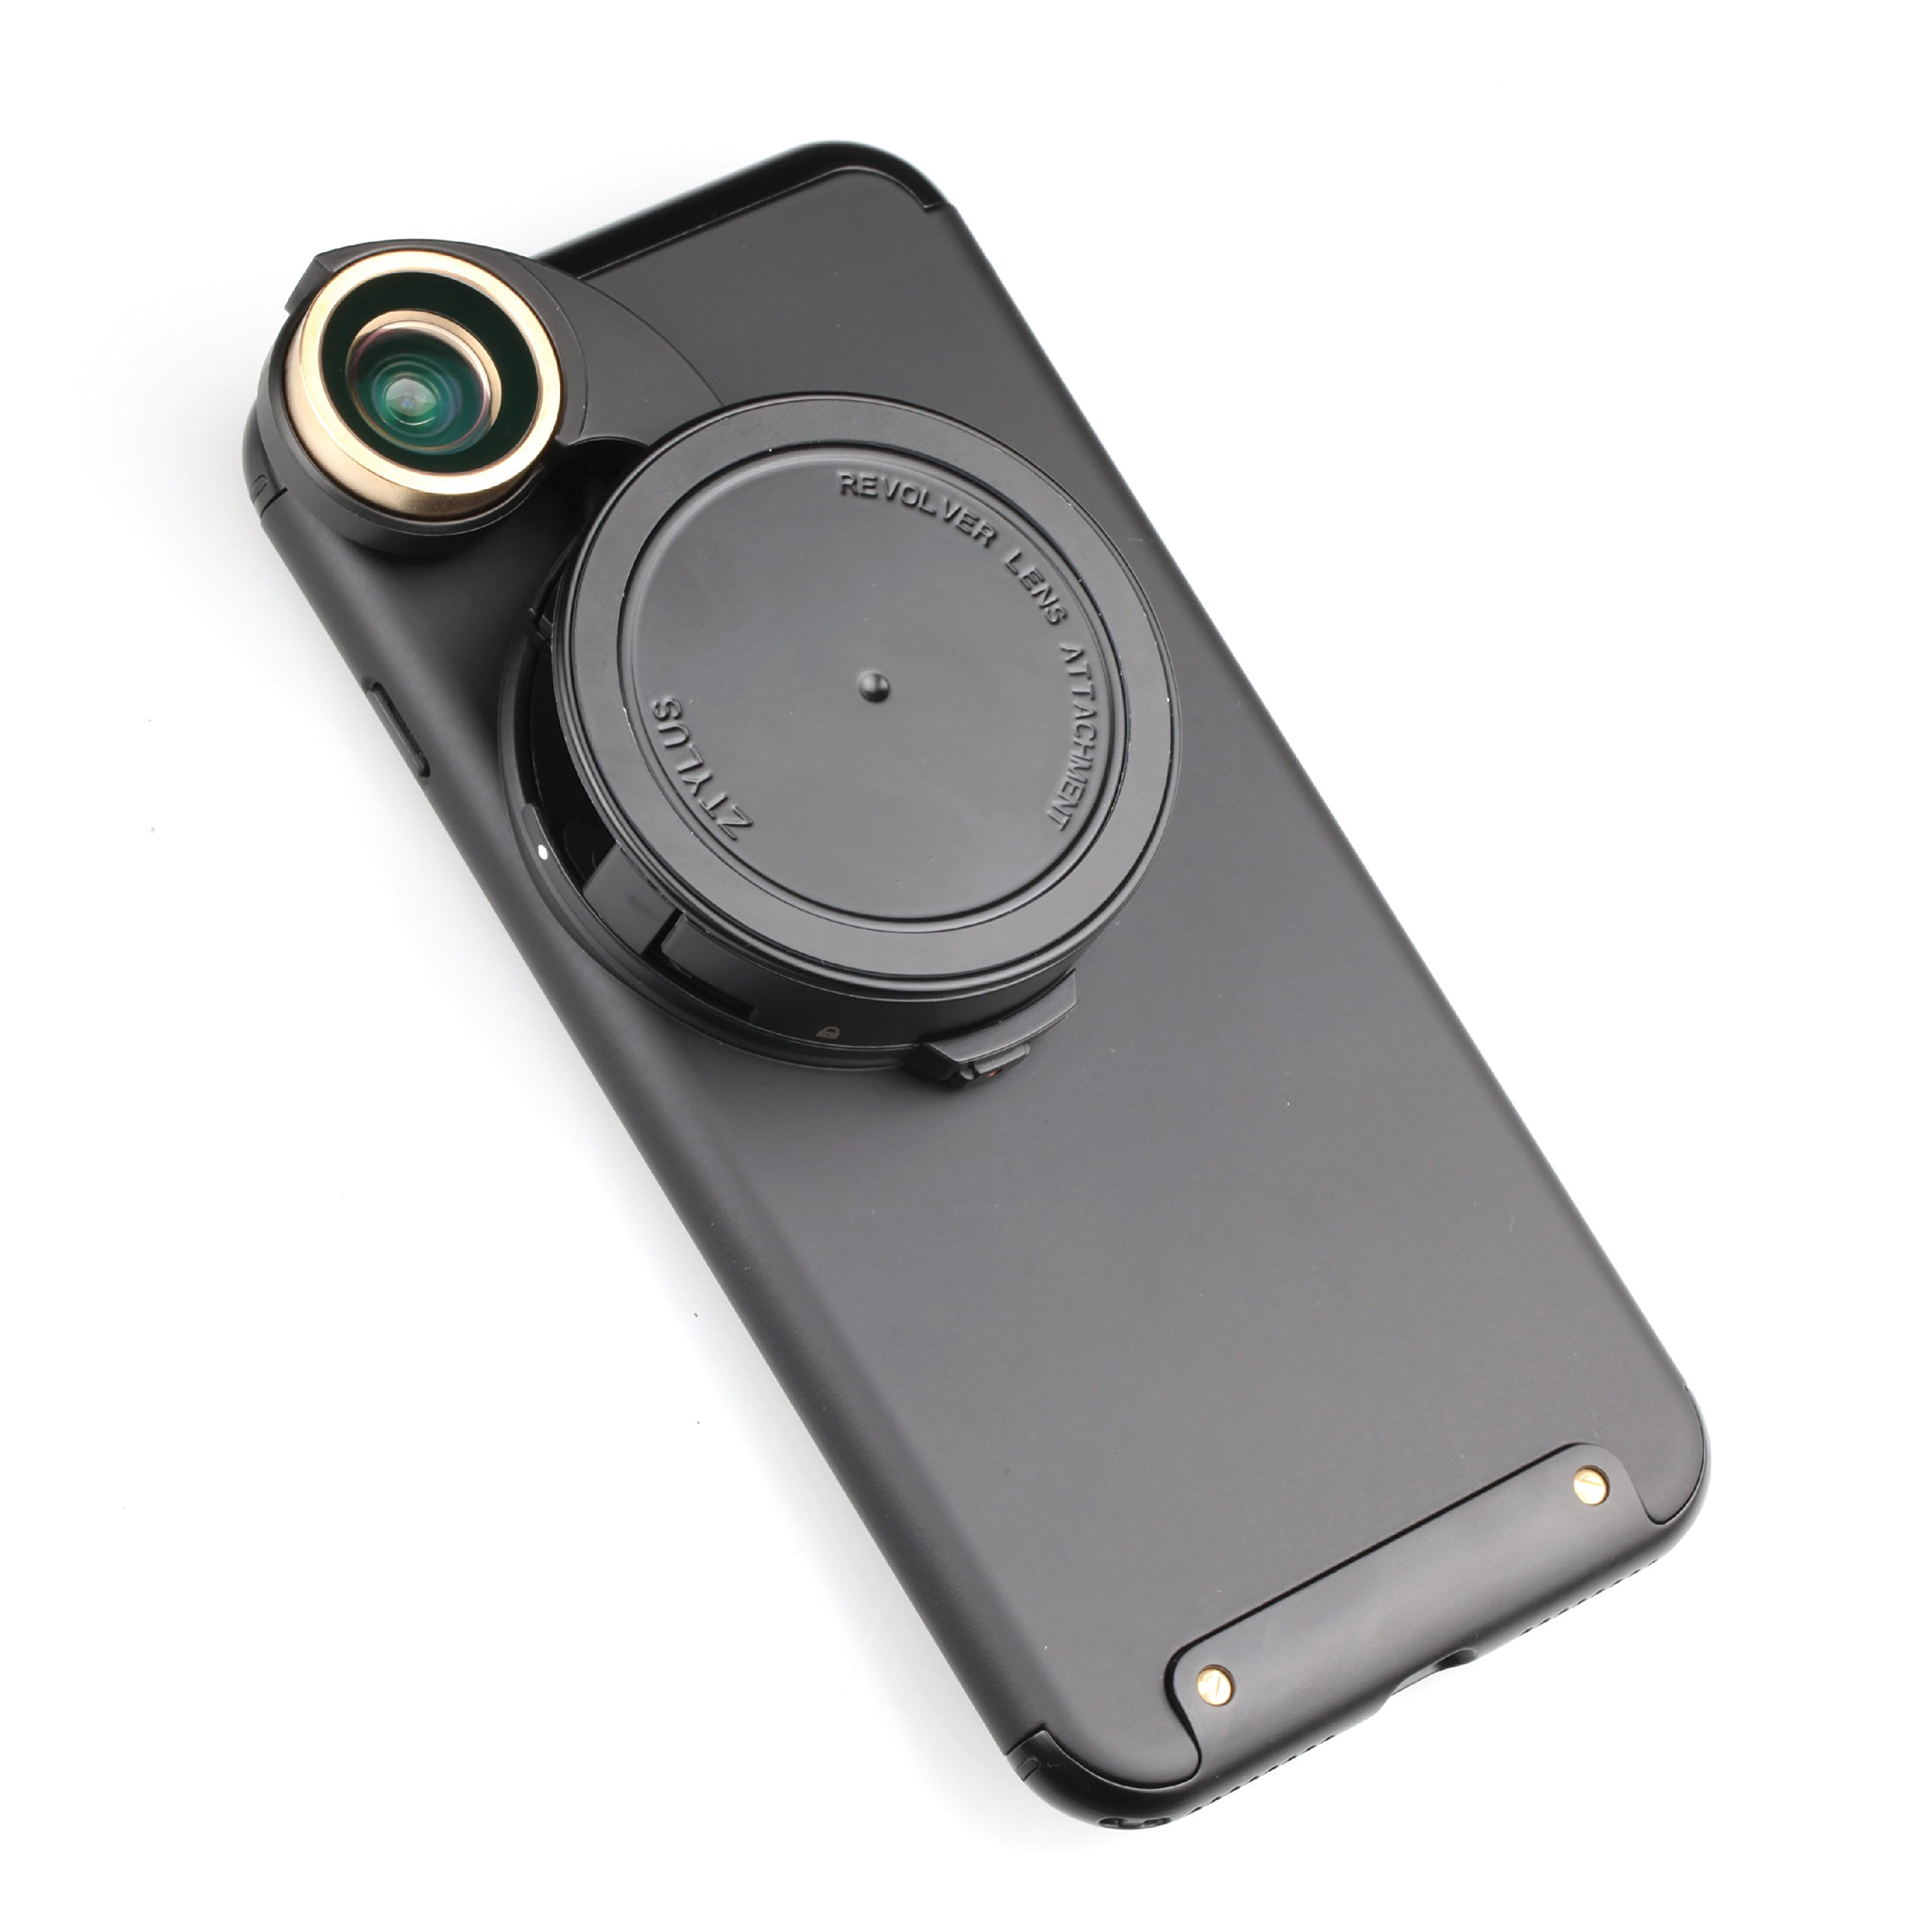 Ztylus 4-in-1 Revolver Lens Smartphone Camera Kit for Apple iPhone 7 Plus: Super Wide Angle, Macro, Fisheye, CPL, Protective Case, Phone Camera, Photo Video (Black) by Ztylus